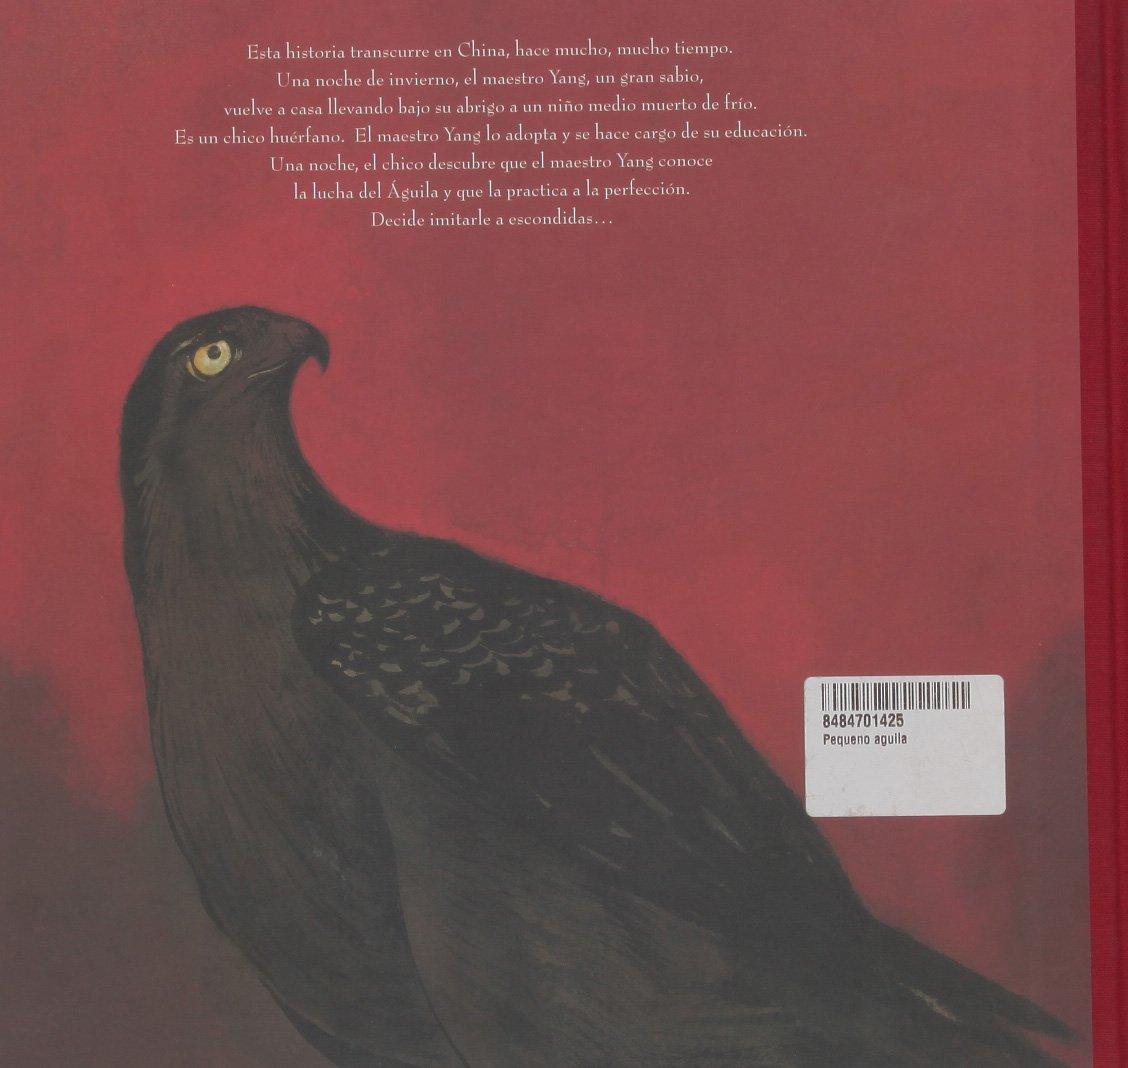 Pequeno aguila (Spanish Edition): Chen Jiang Hong: 9788484701422: Amazon.com: Books